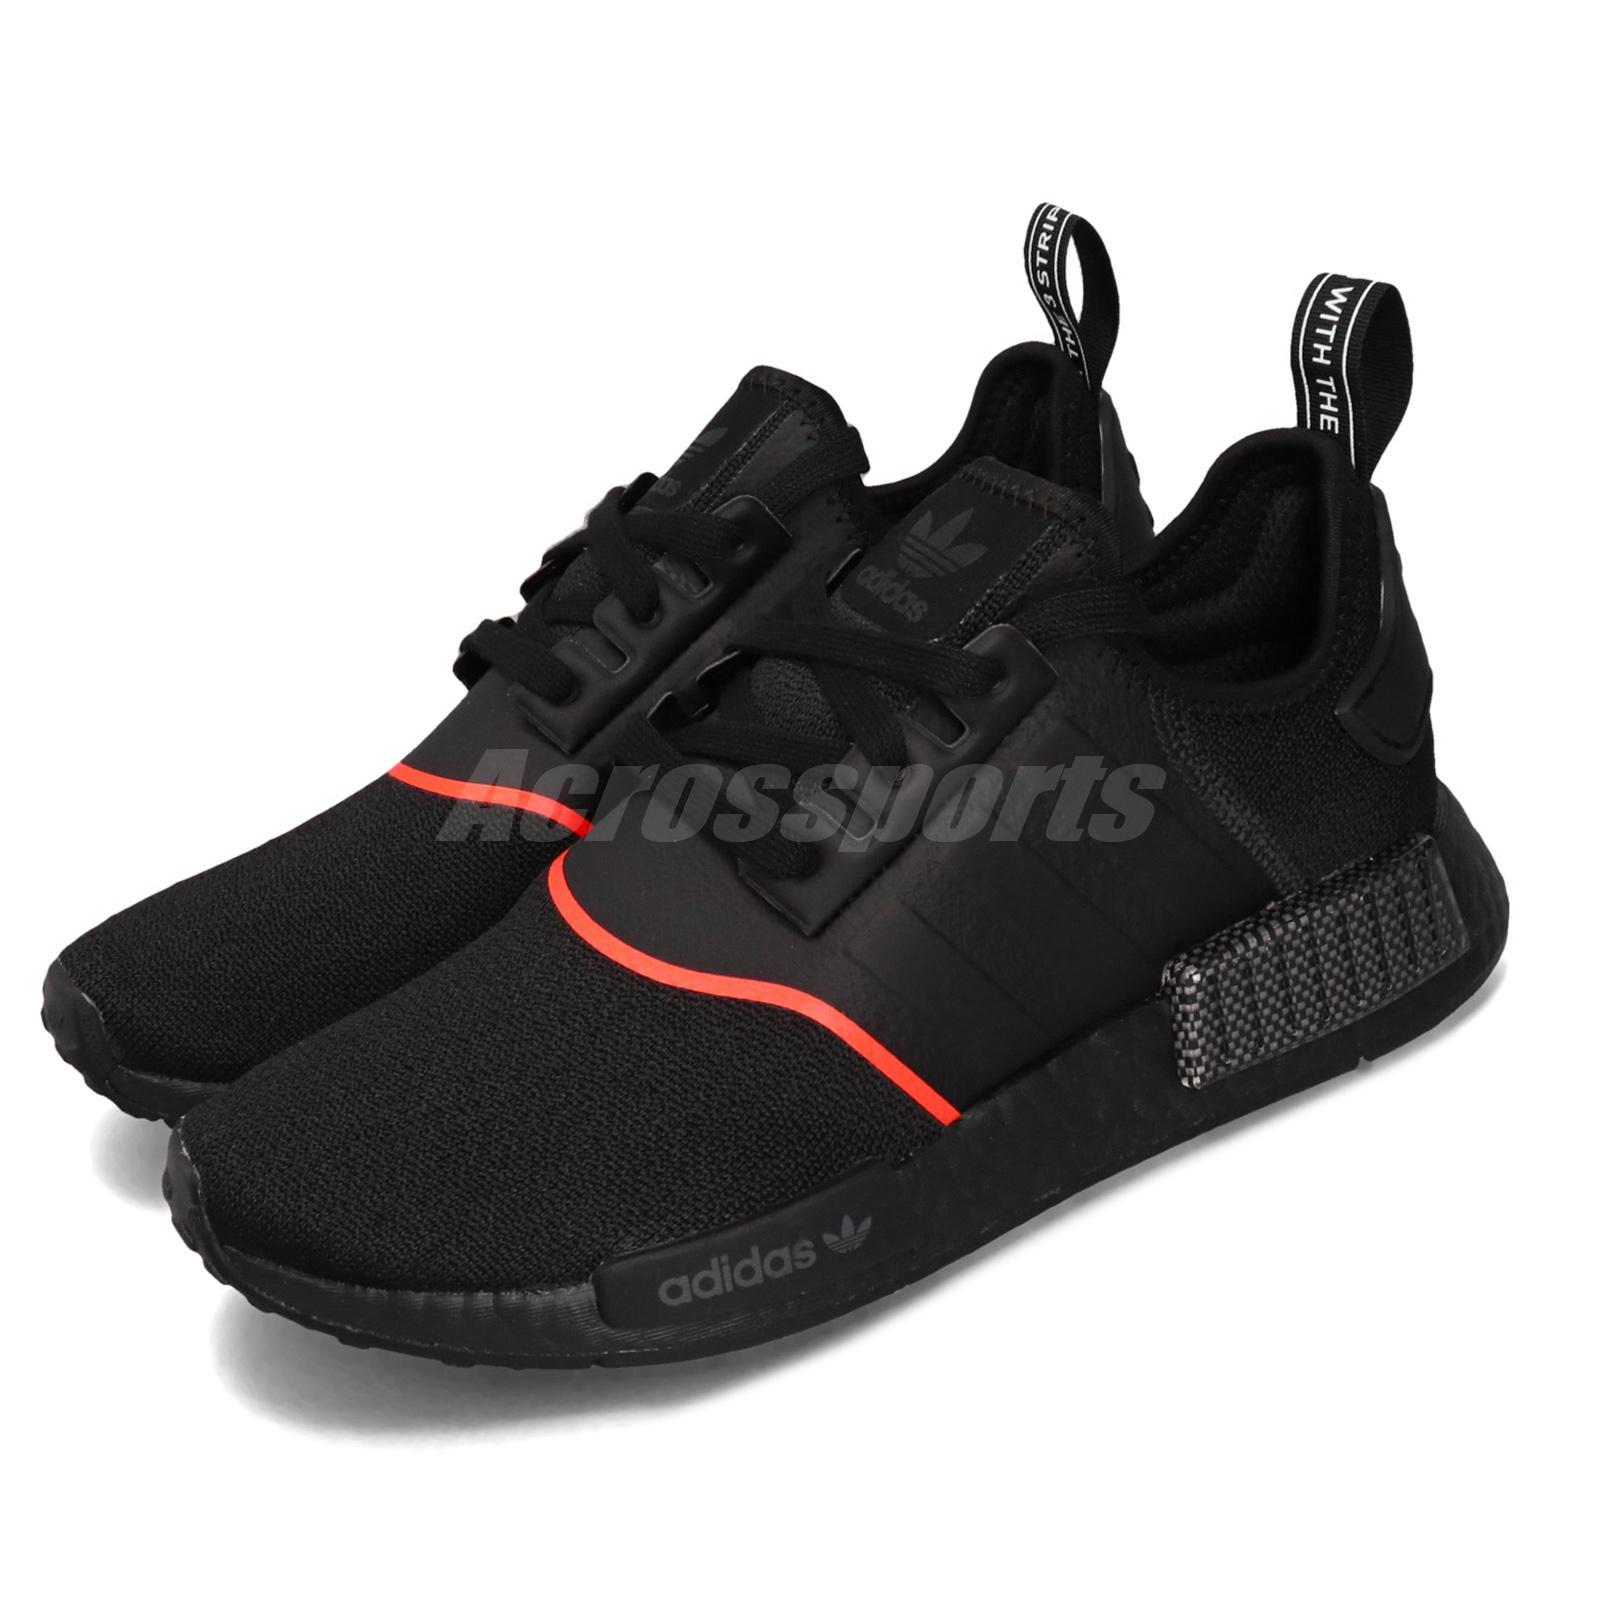 adidas Originals NMD_R1 Boost Black